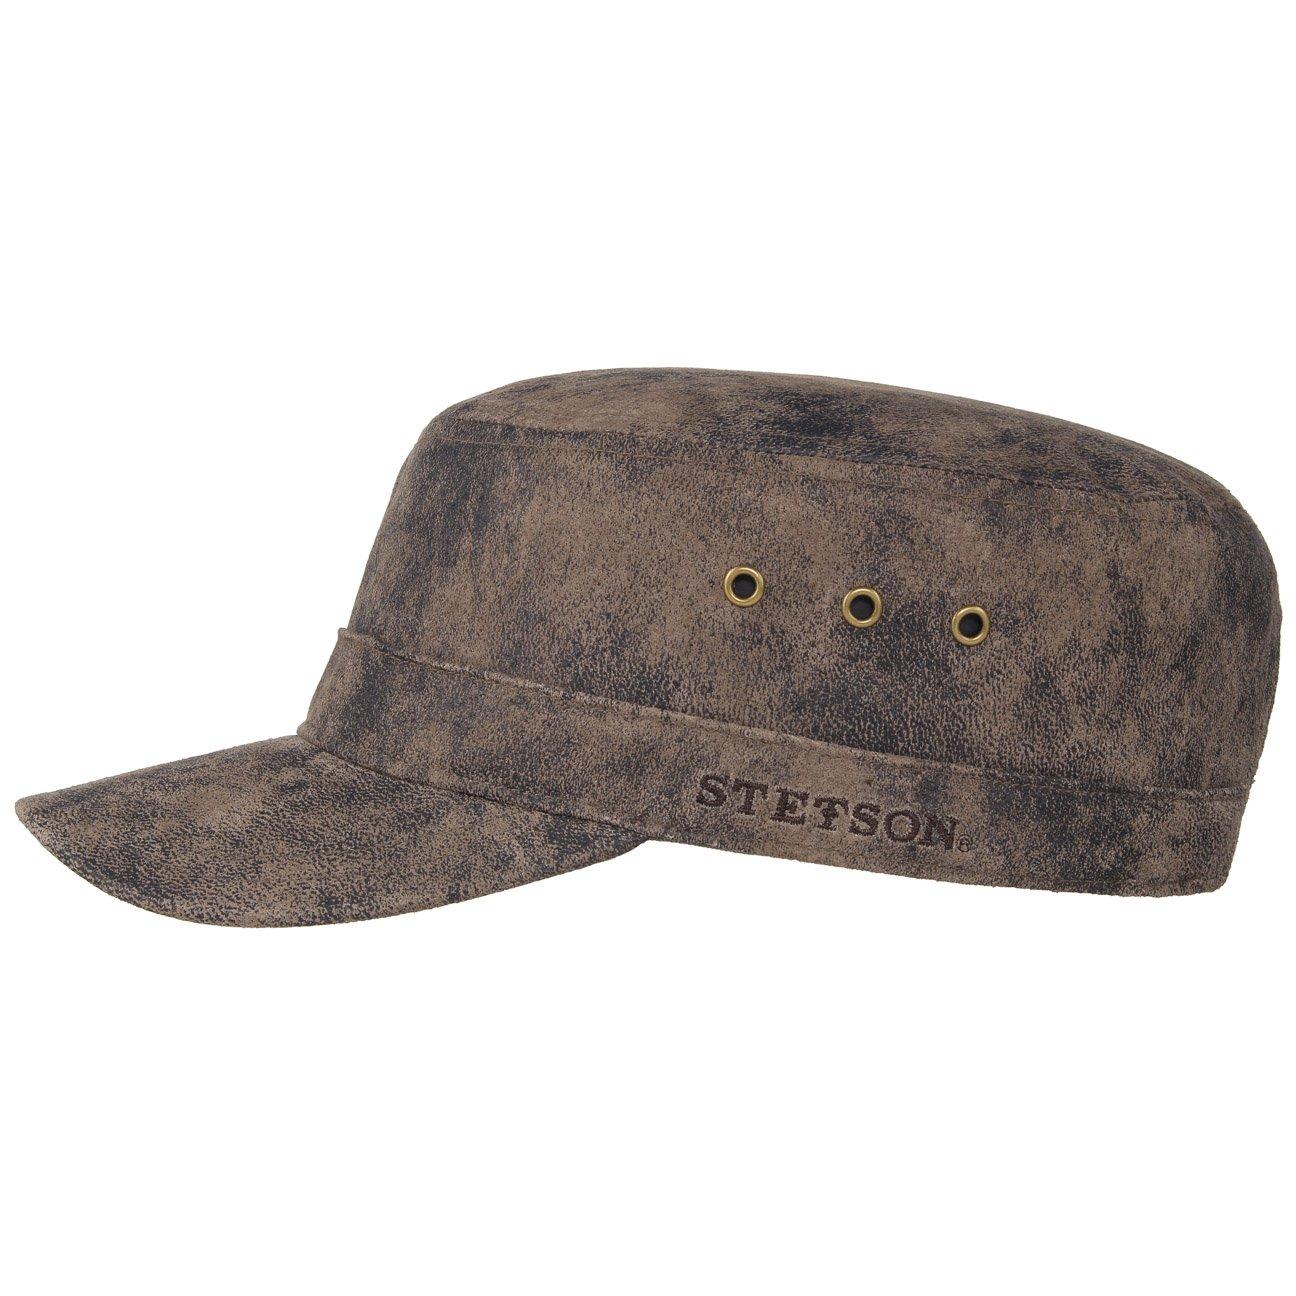 Stetson Raymore Pigskin Armycap Military Urban Cap Ledercap ...